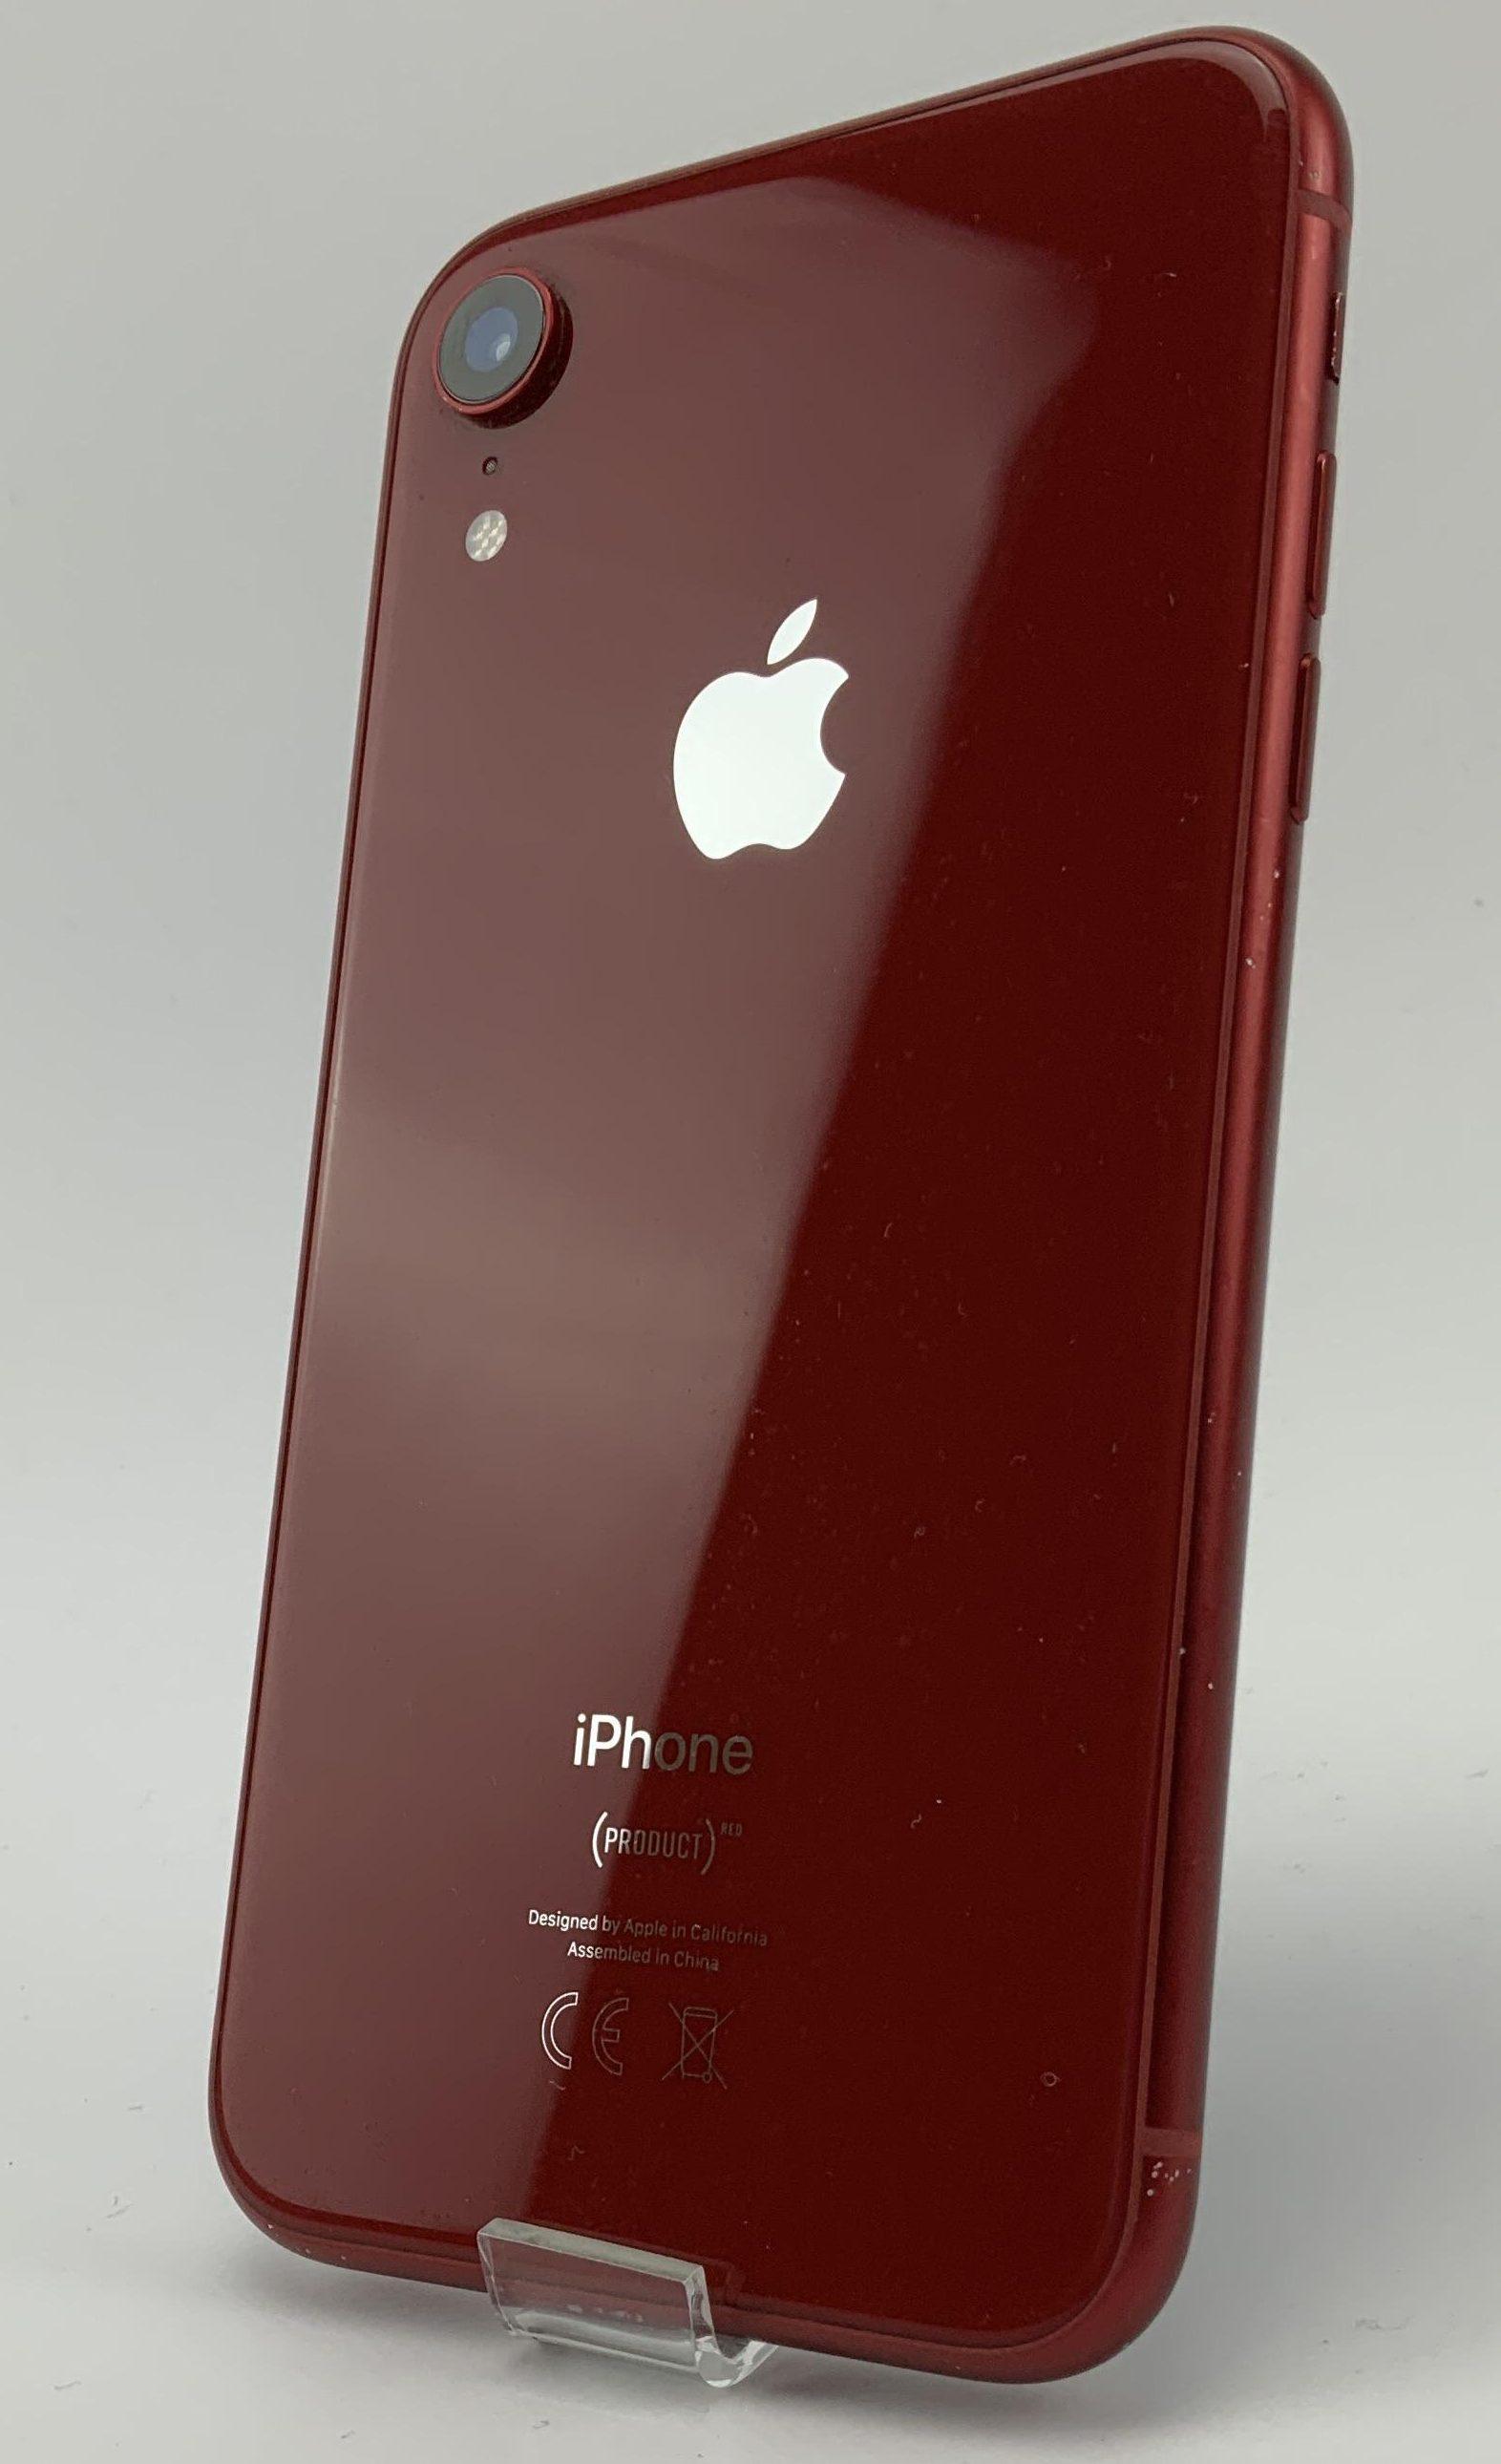 iPhone XR 64GB, 64GB, Red, Kuva 3